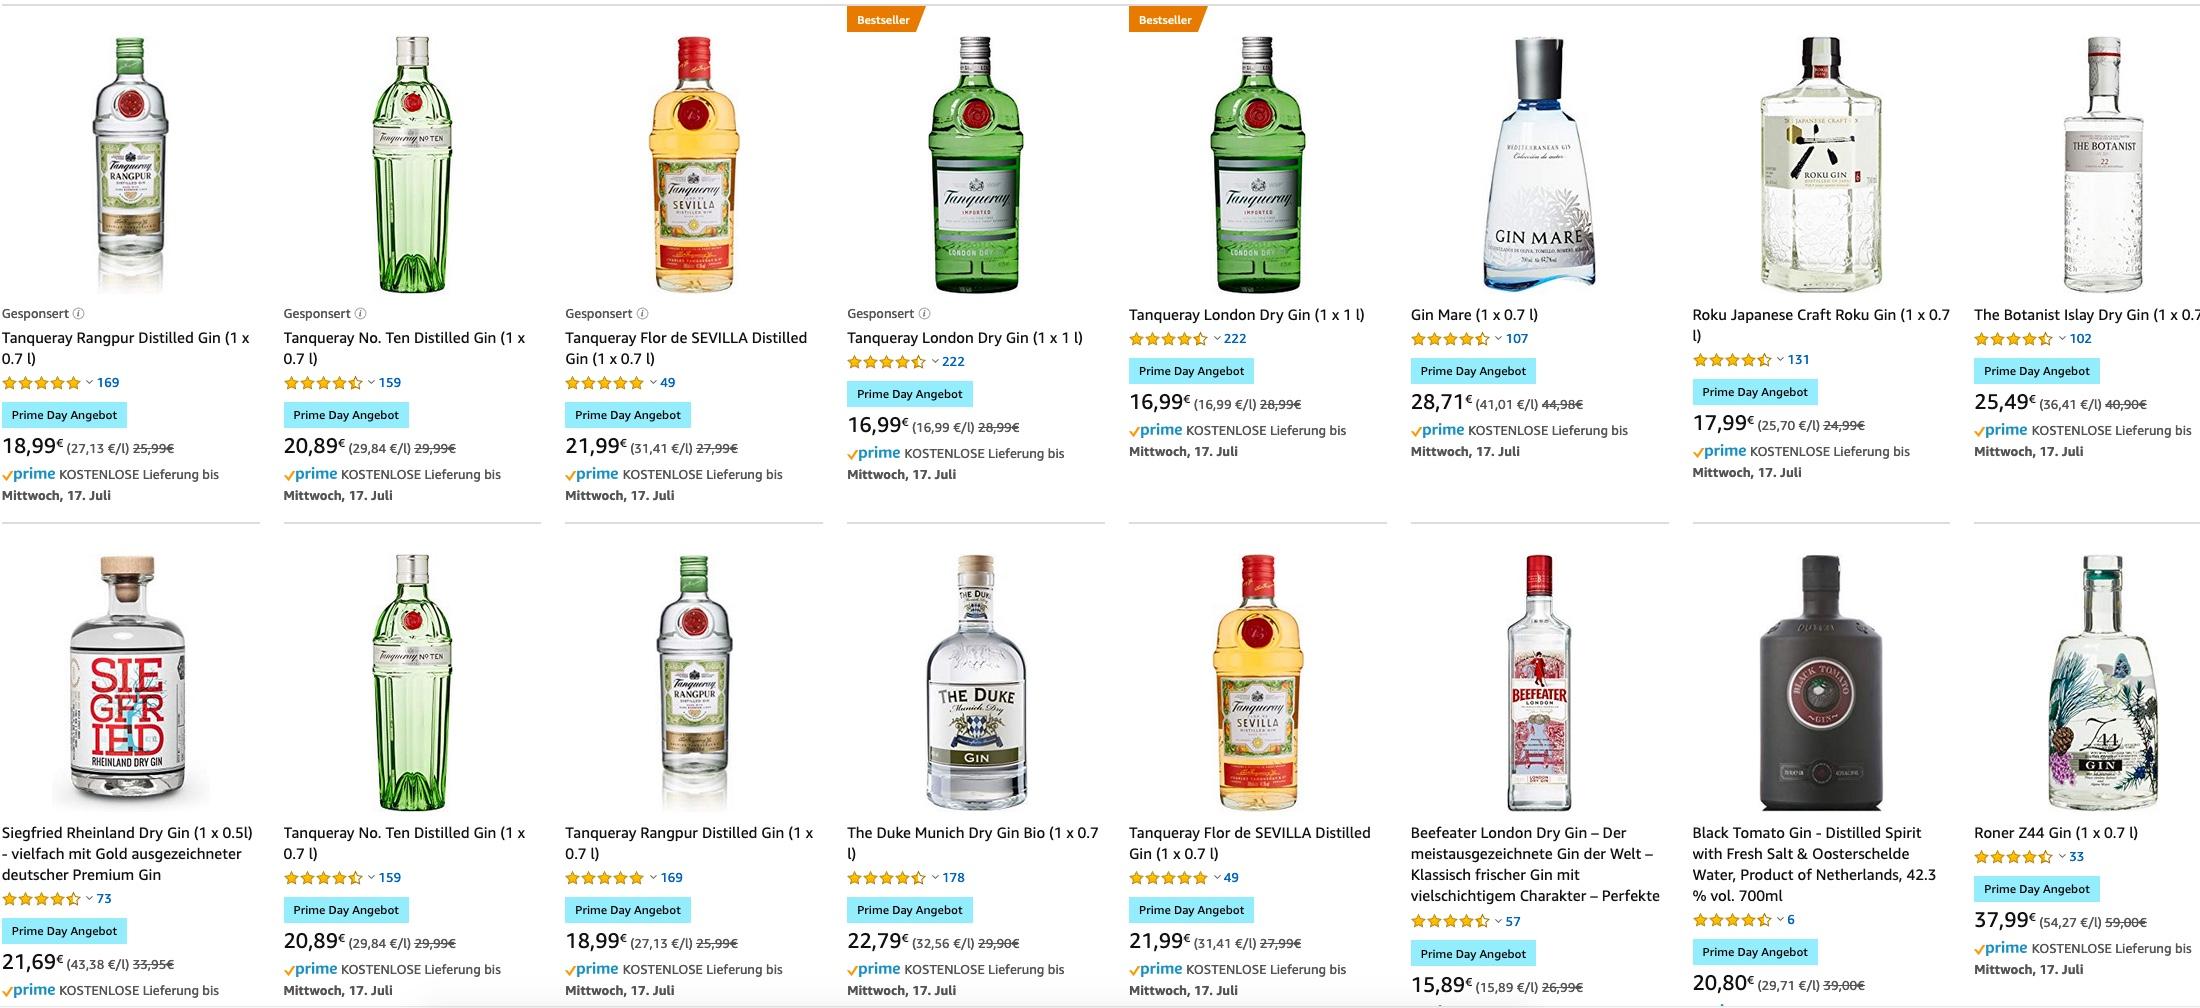 [amazon] [Prime Day] Whisky Angebote u.a. Bruichladdich, Talisker, Glengoyne uvm.